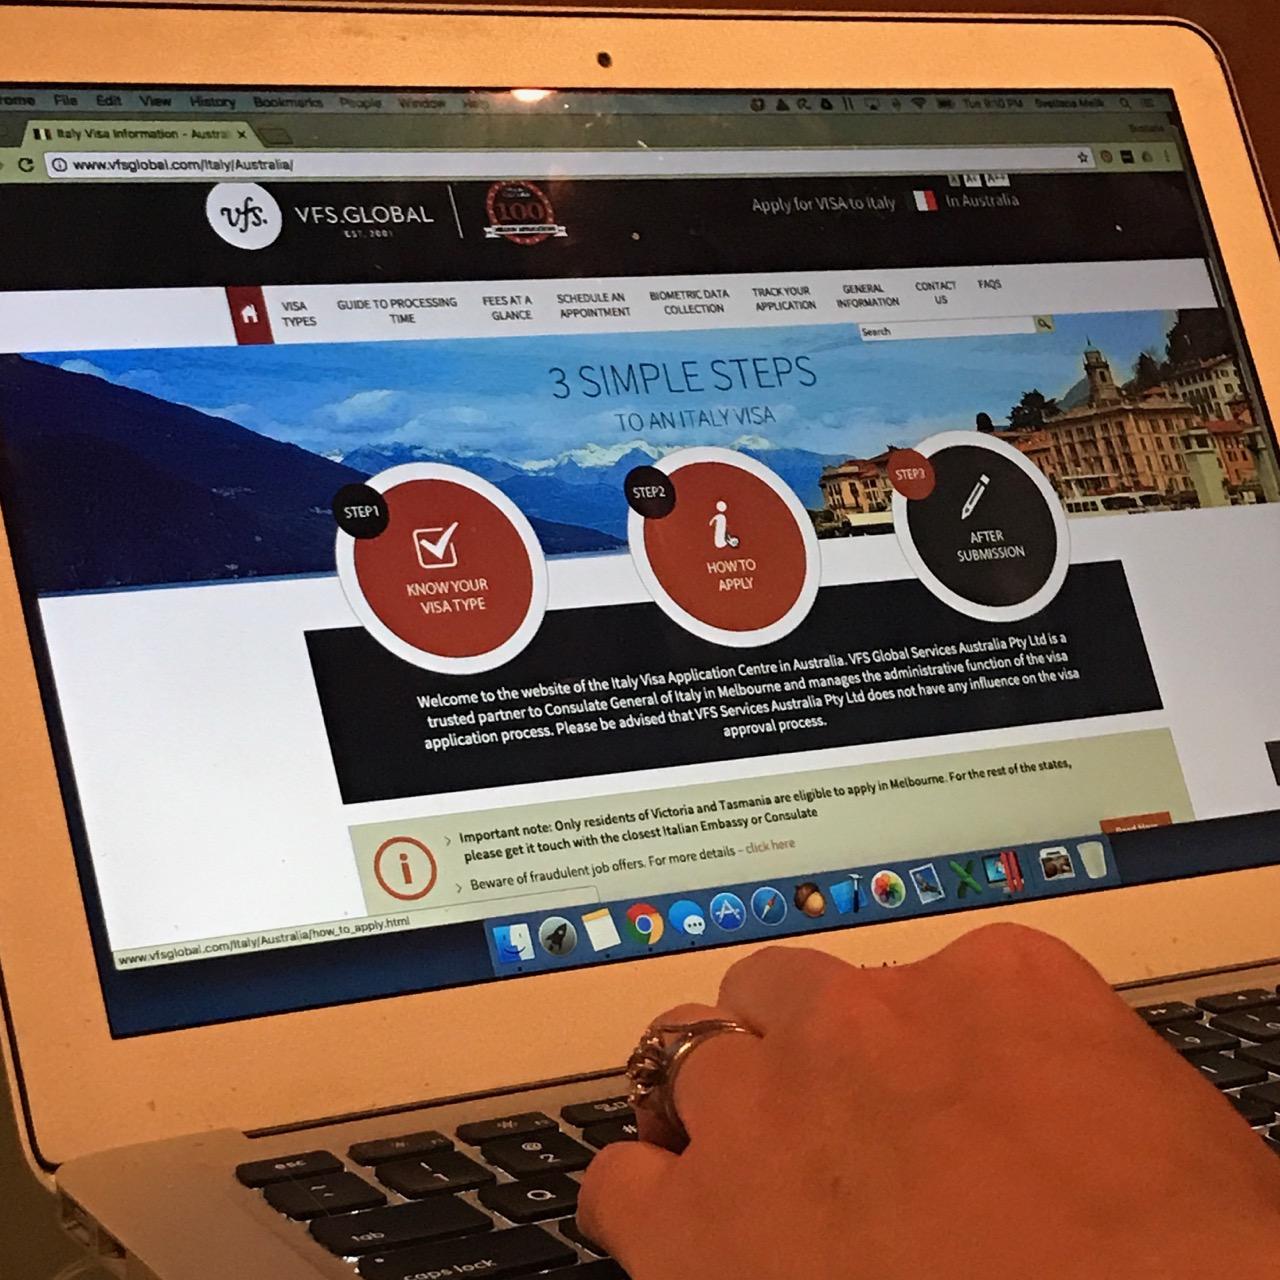 Visa website on laptop screen